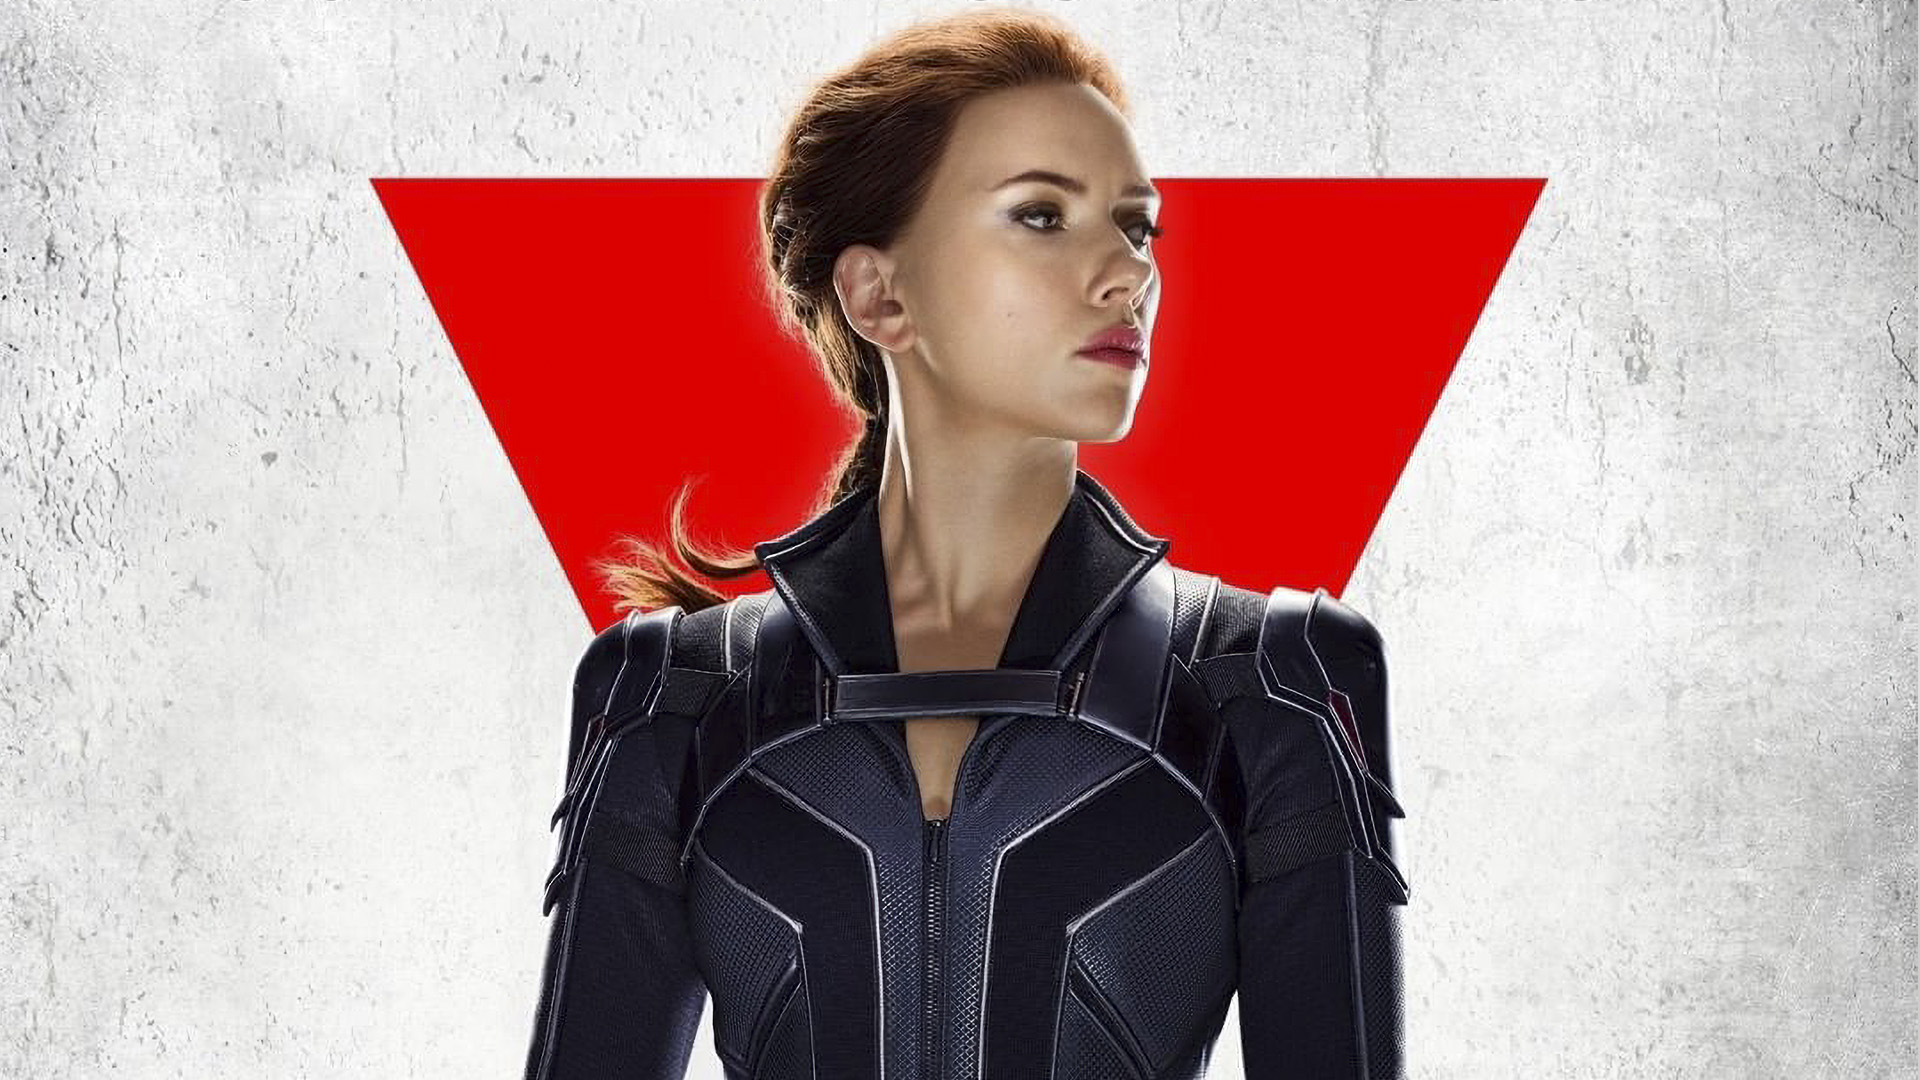 Scarlett Johansson Has 'No Plans' To Return As 'Black Widow'